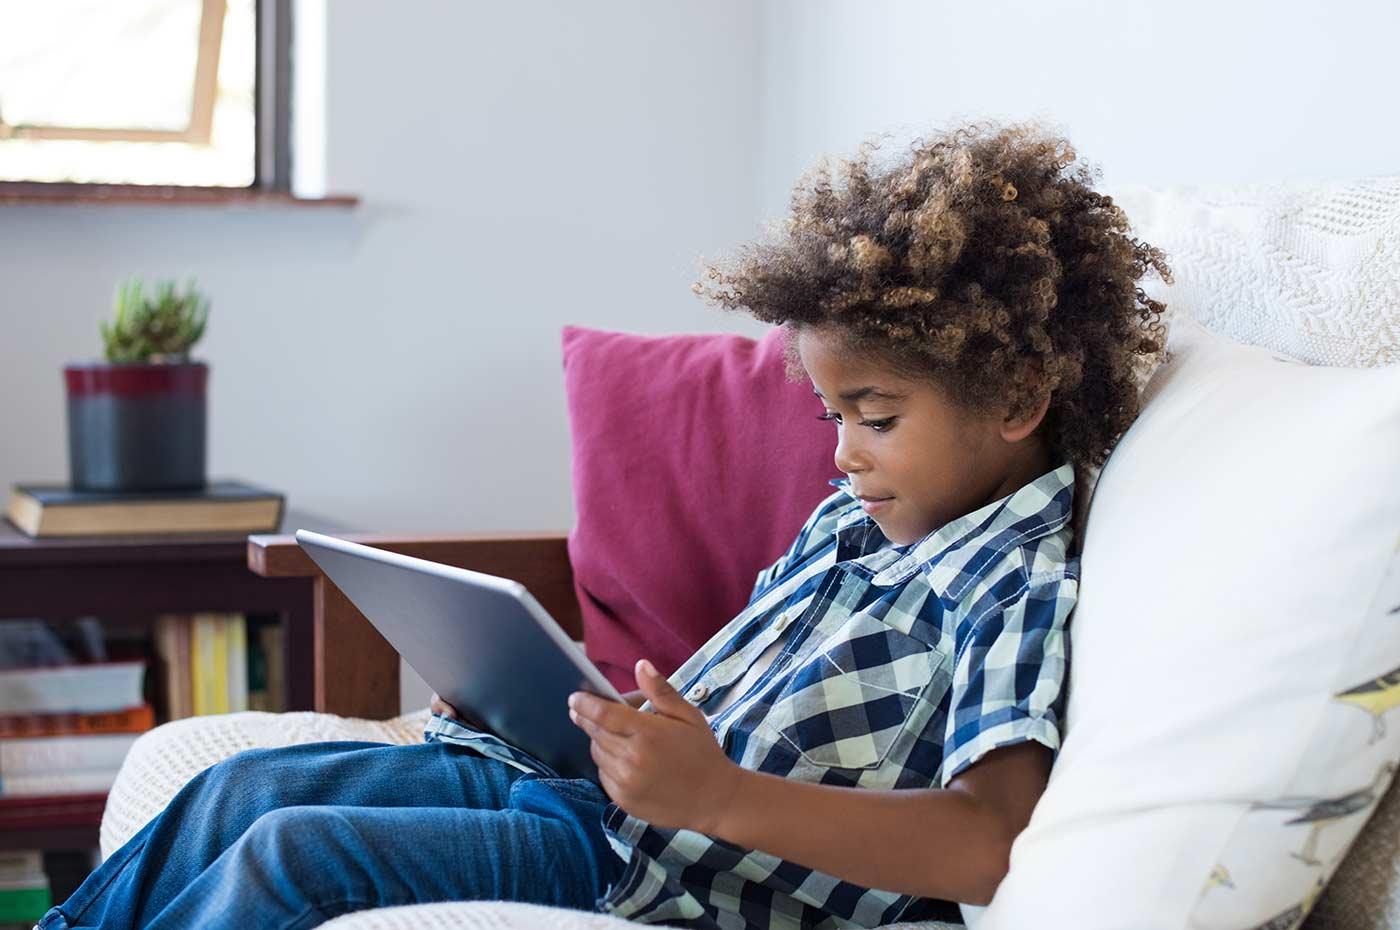 Little boy on a tablet